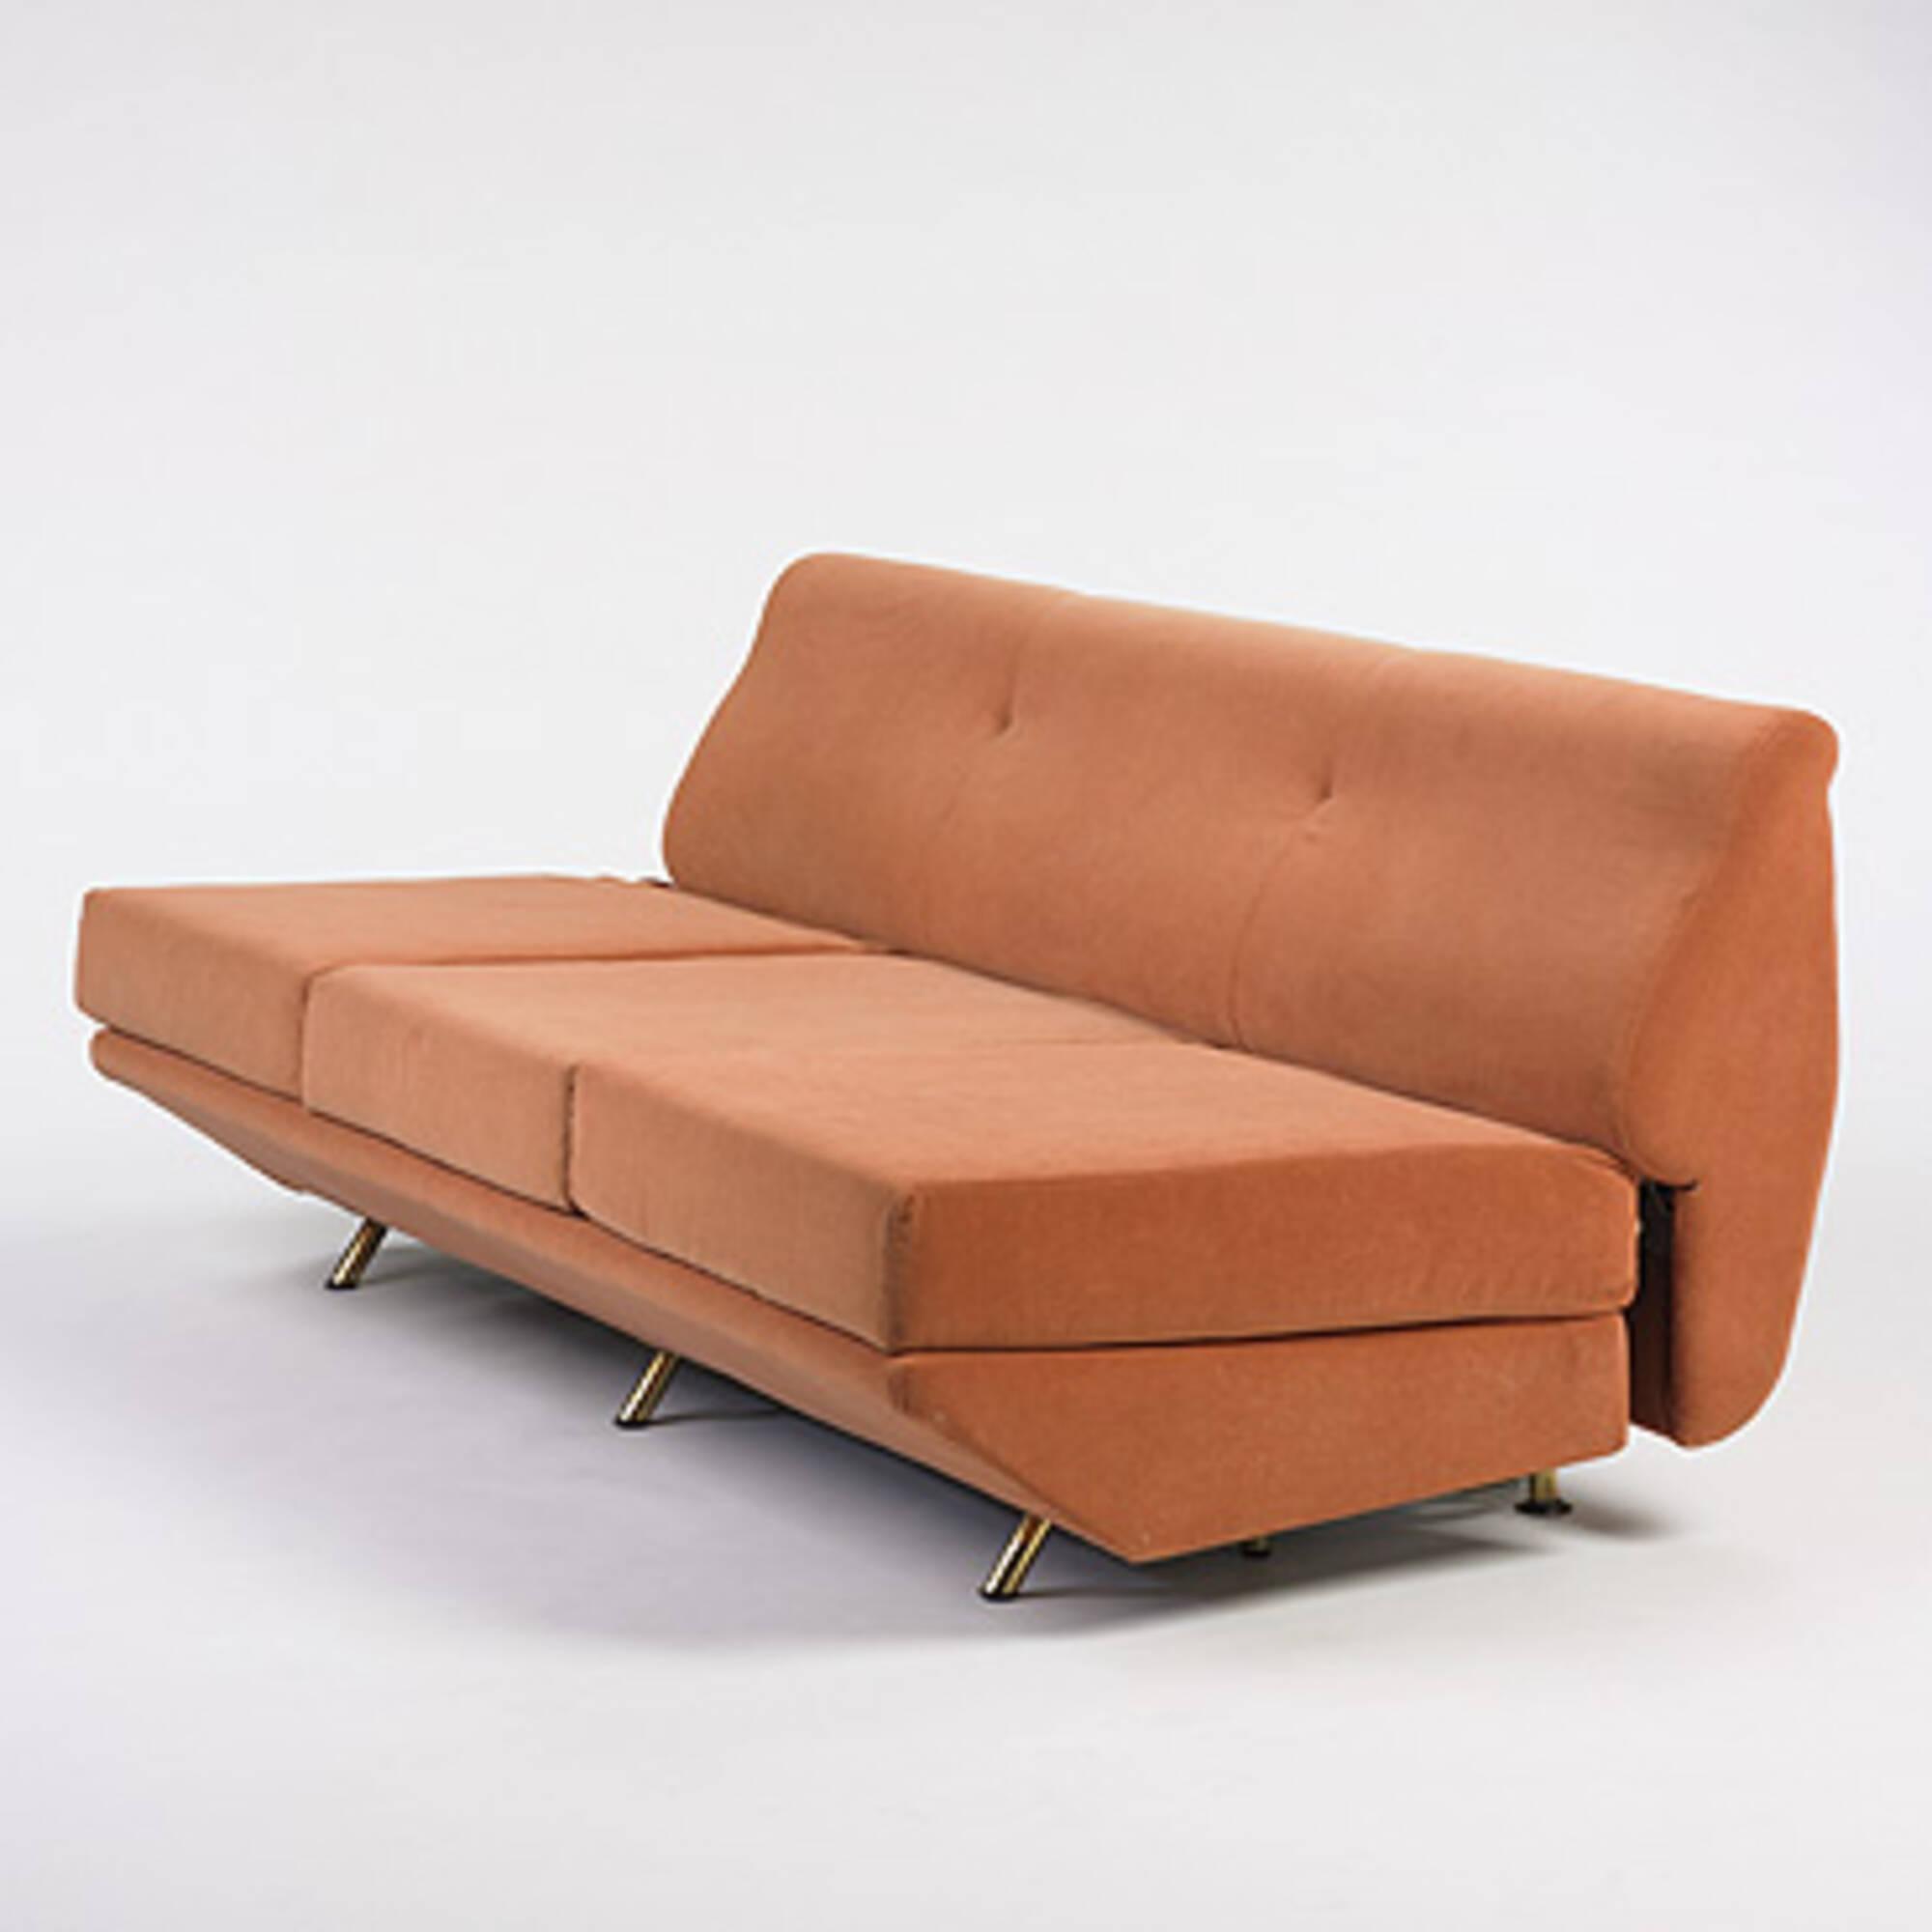 620 Marco Zanuso Sleep O Matic Sofa Important 20th Century